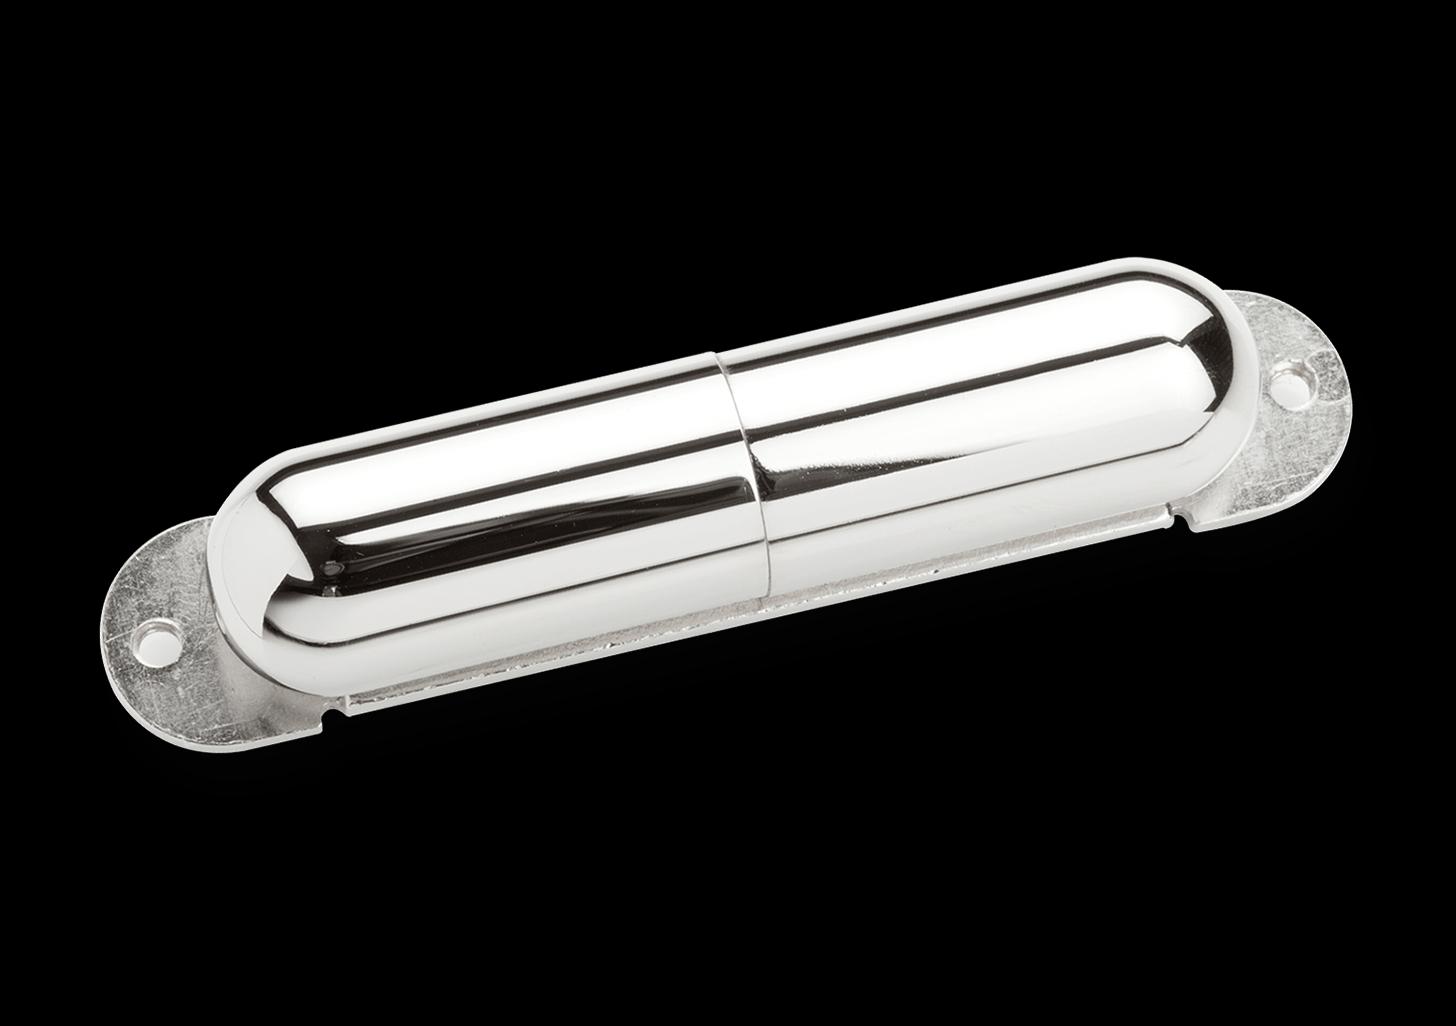 Seymour Duncan SLS-1b Lipstick Strat Custom (B)